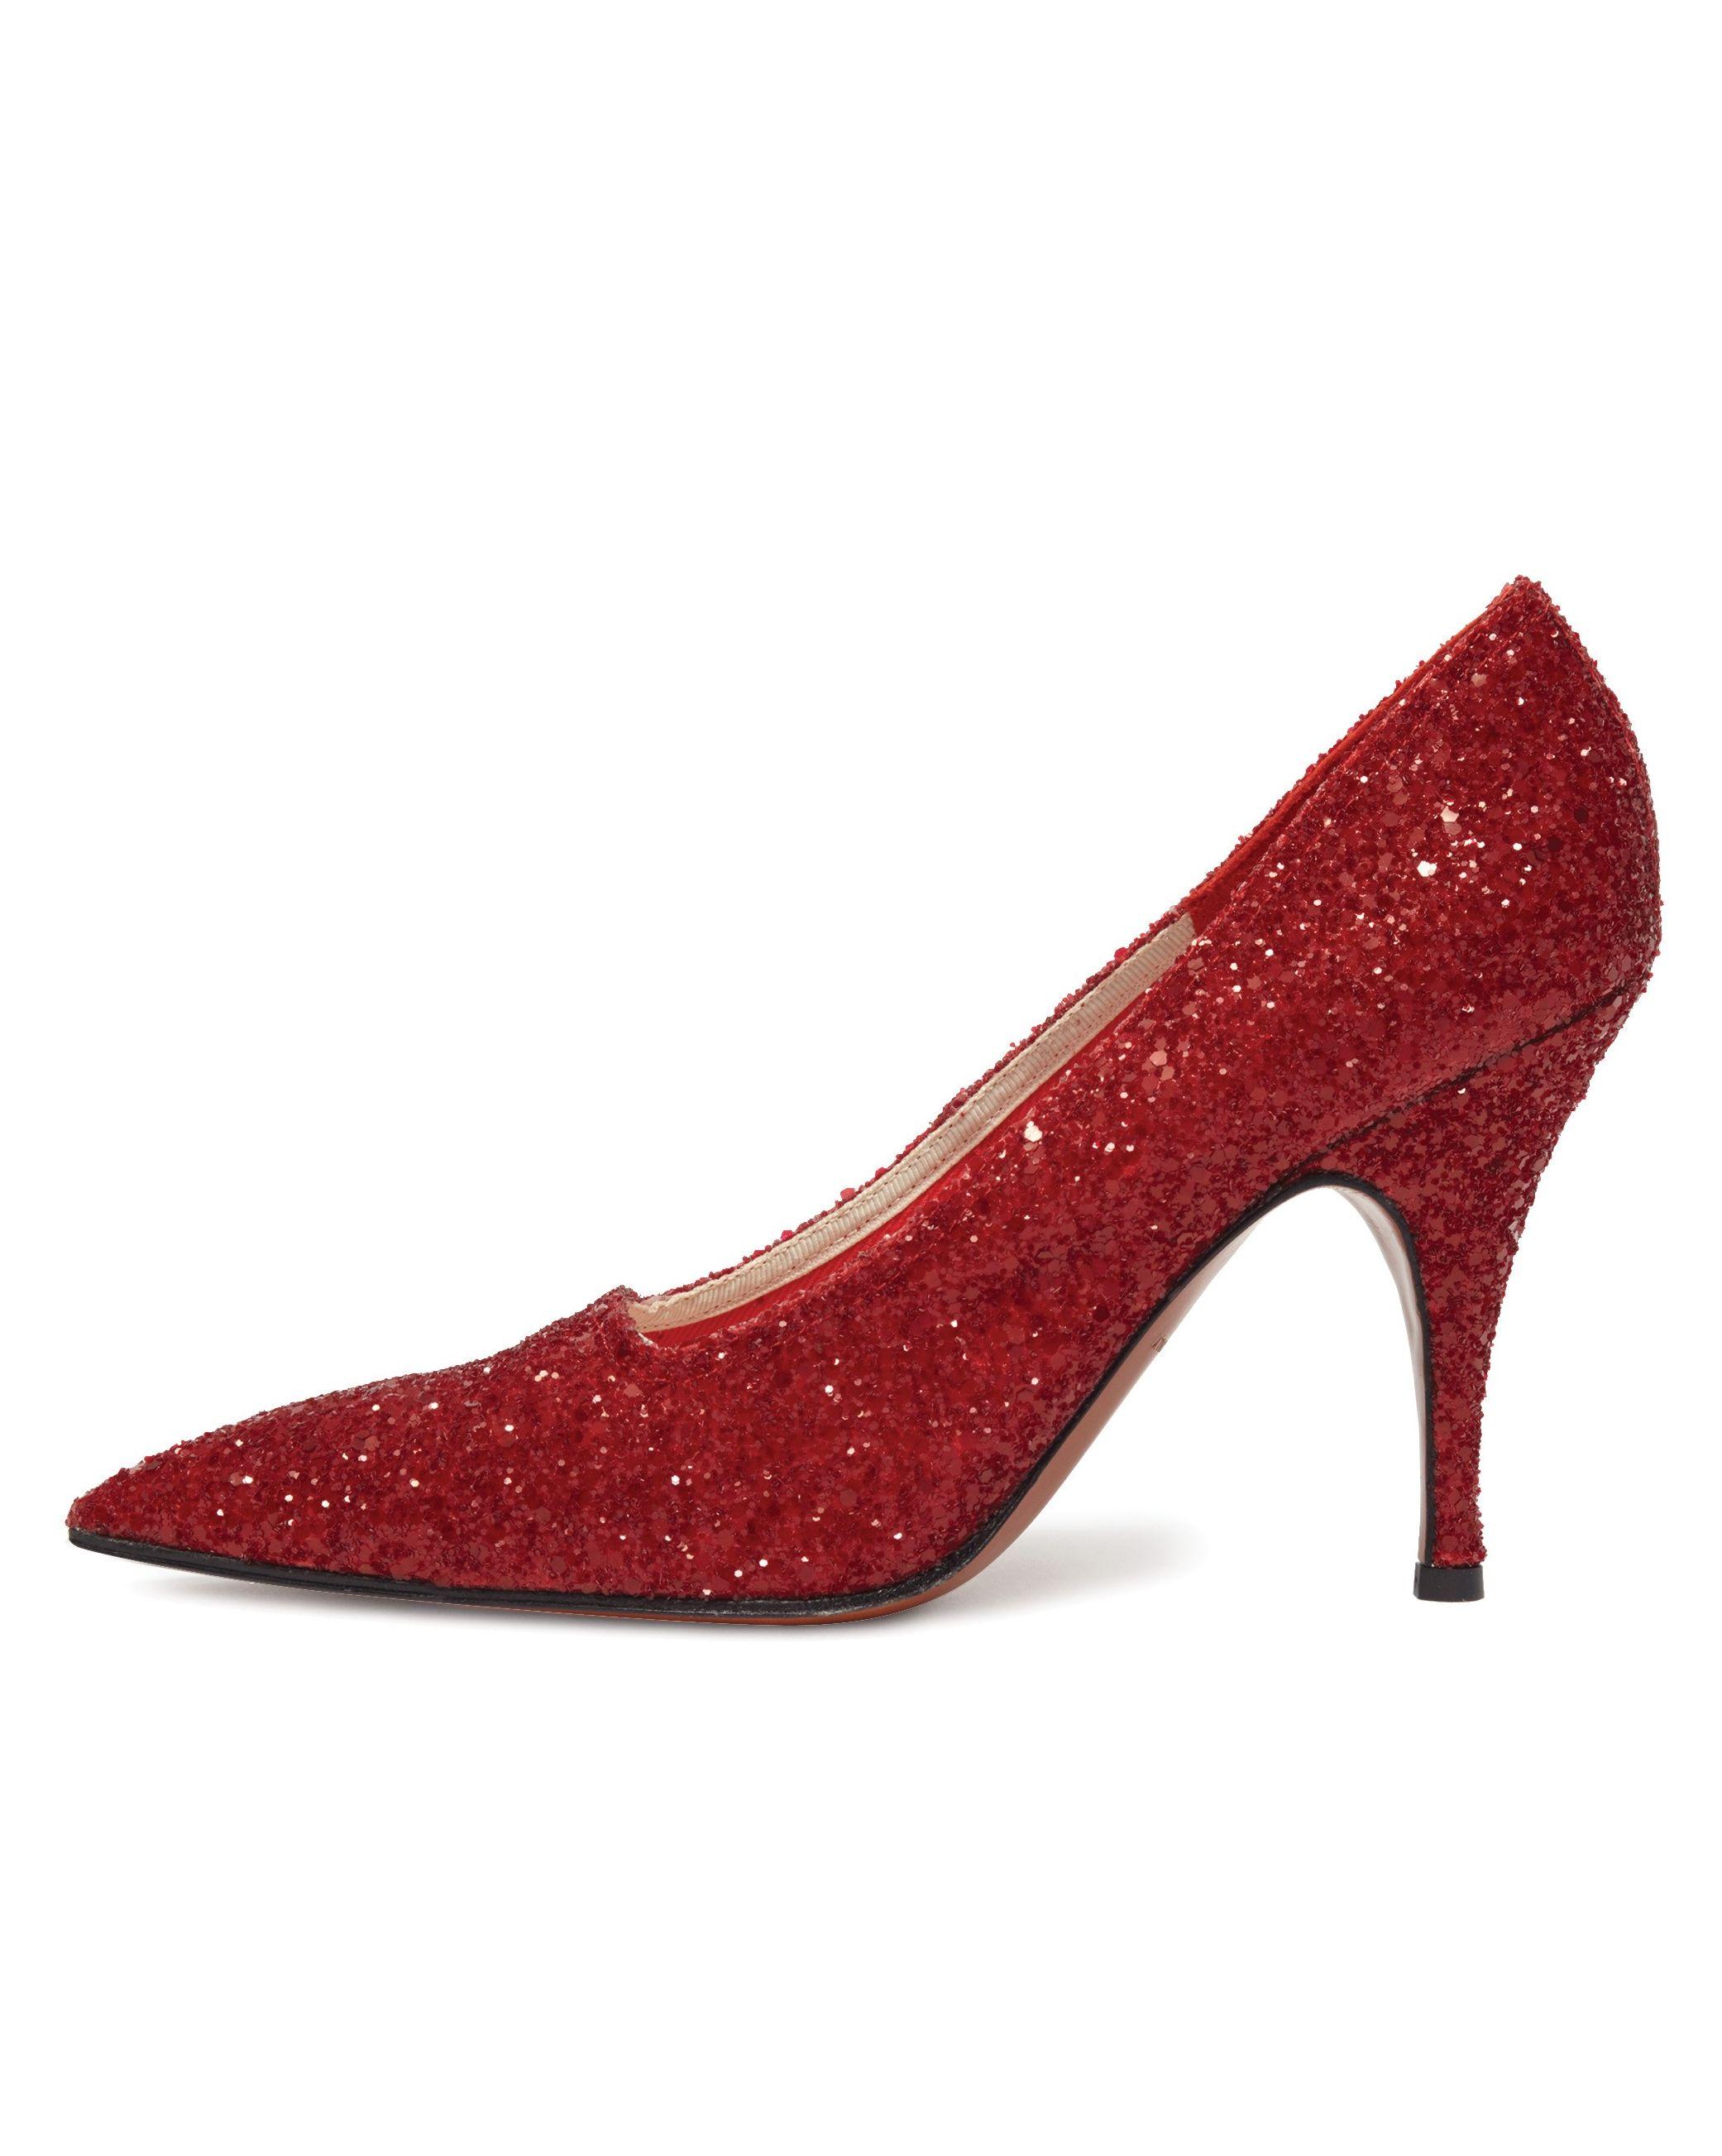 Victoria Beckham glitter shoes